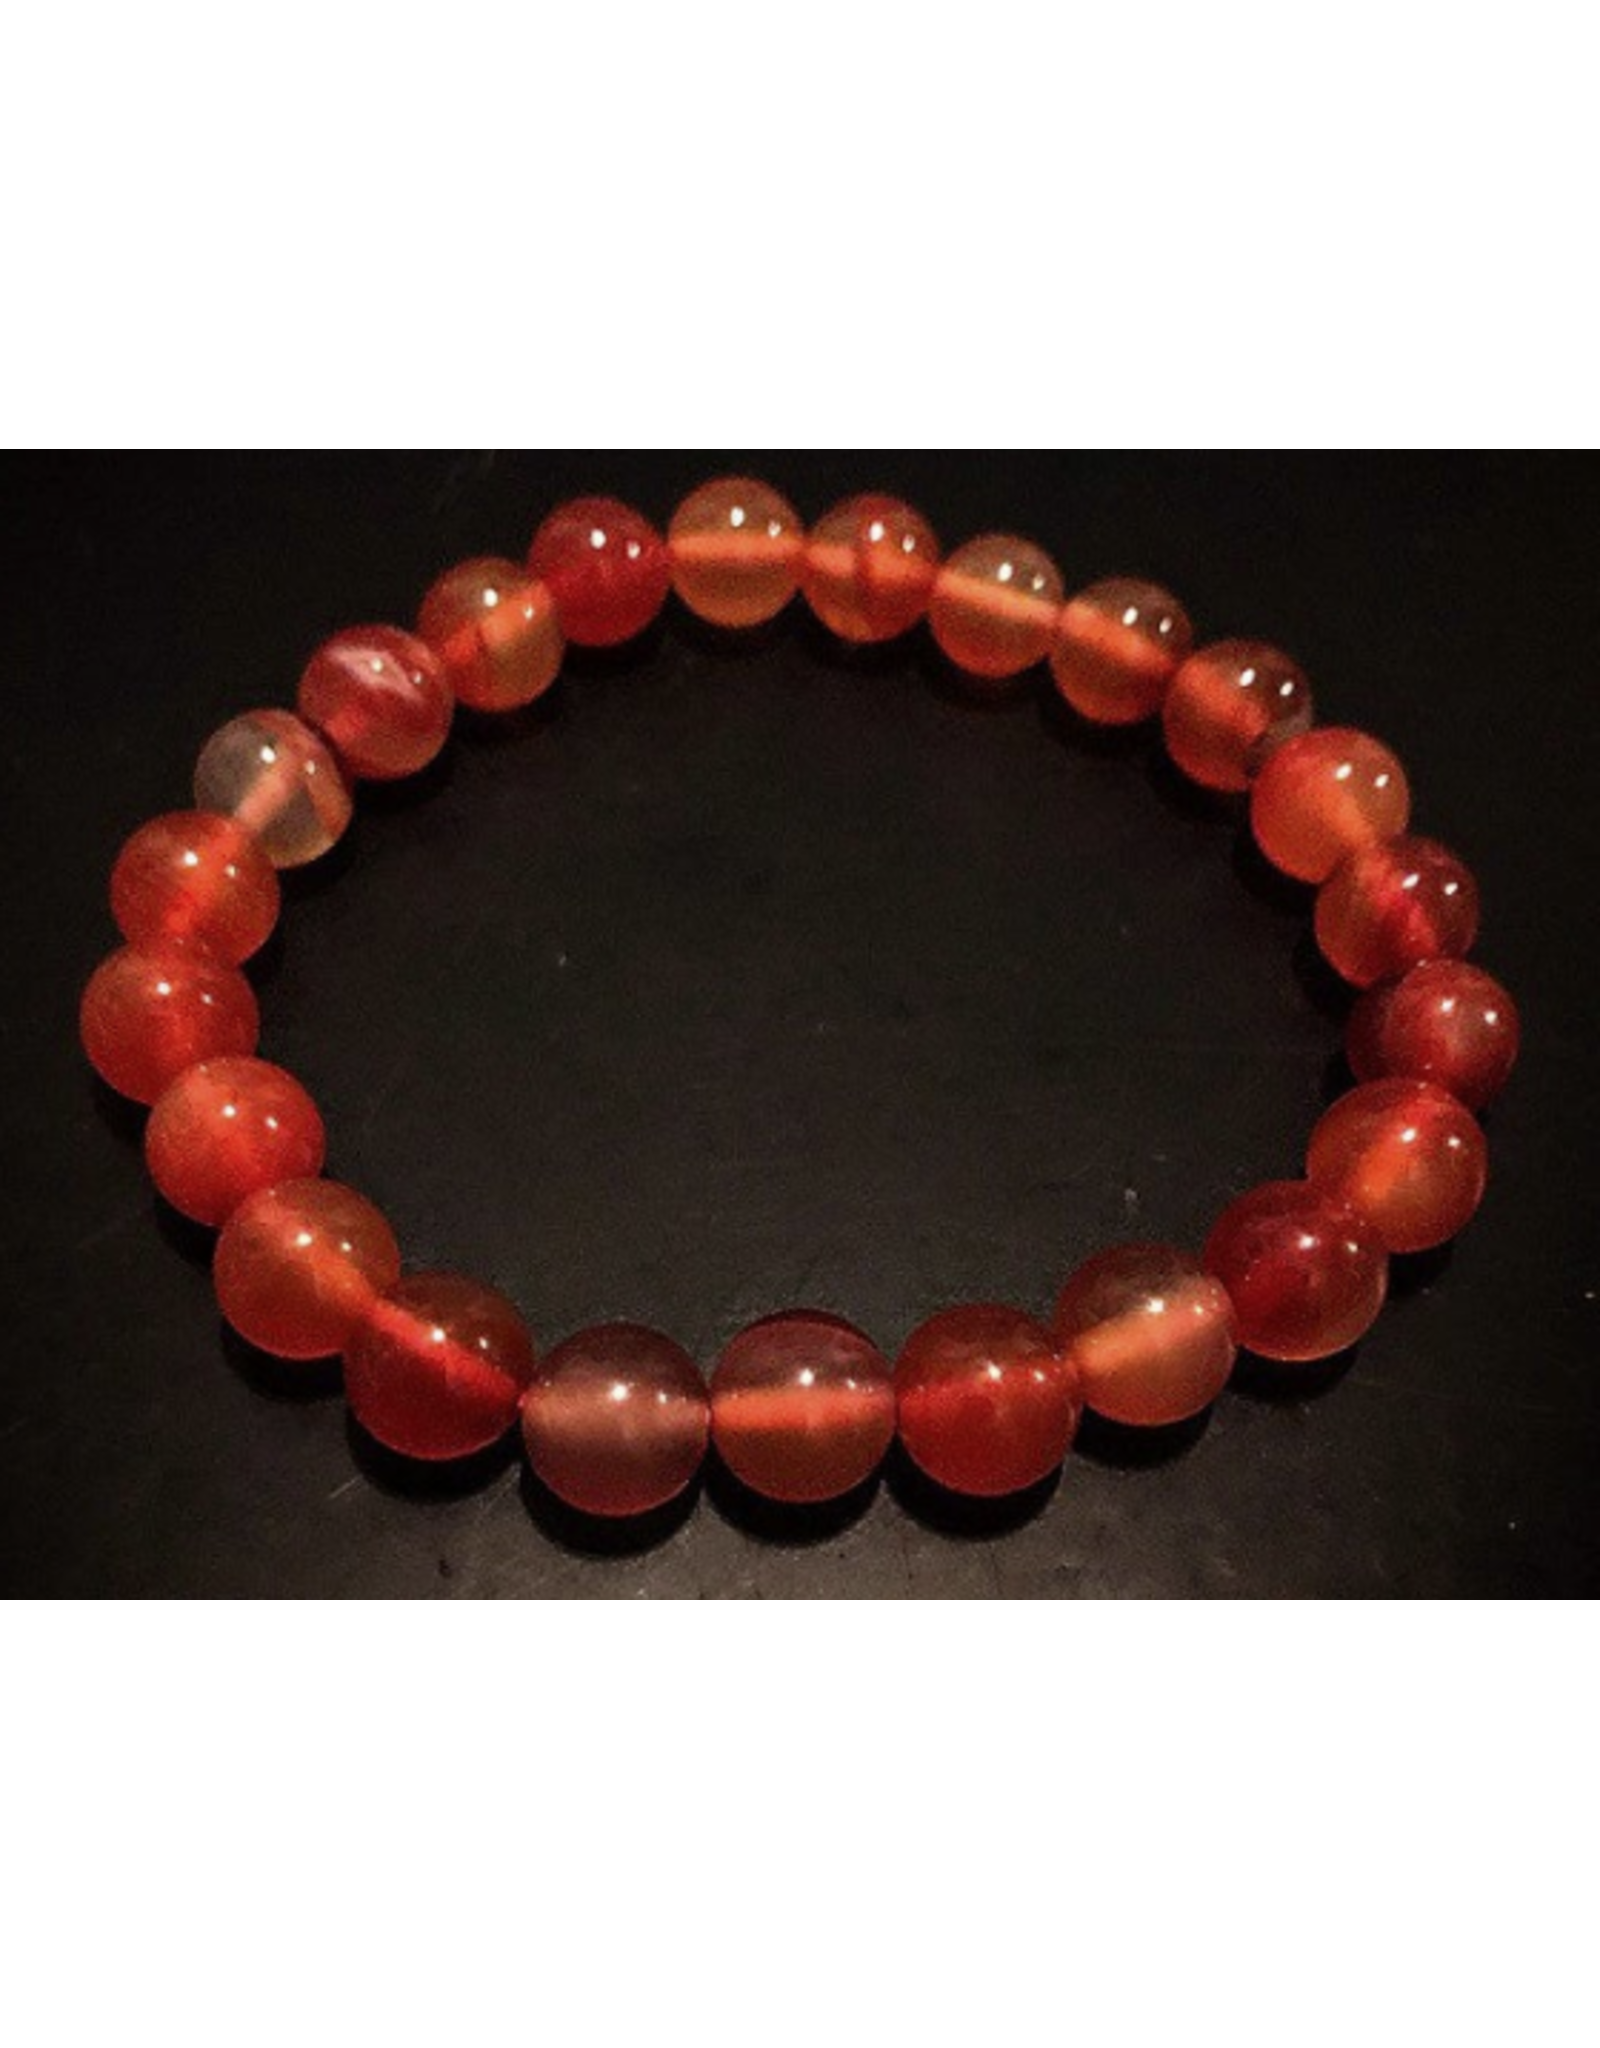 Brown & Red Agate Bracelet 4mm